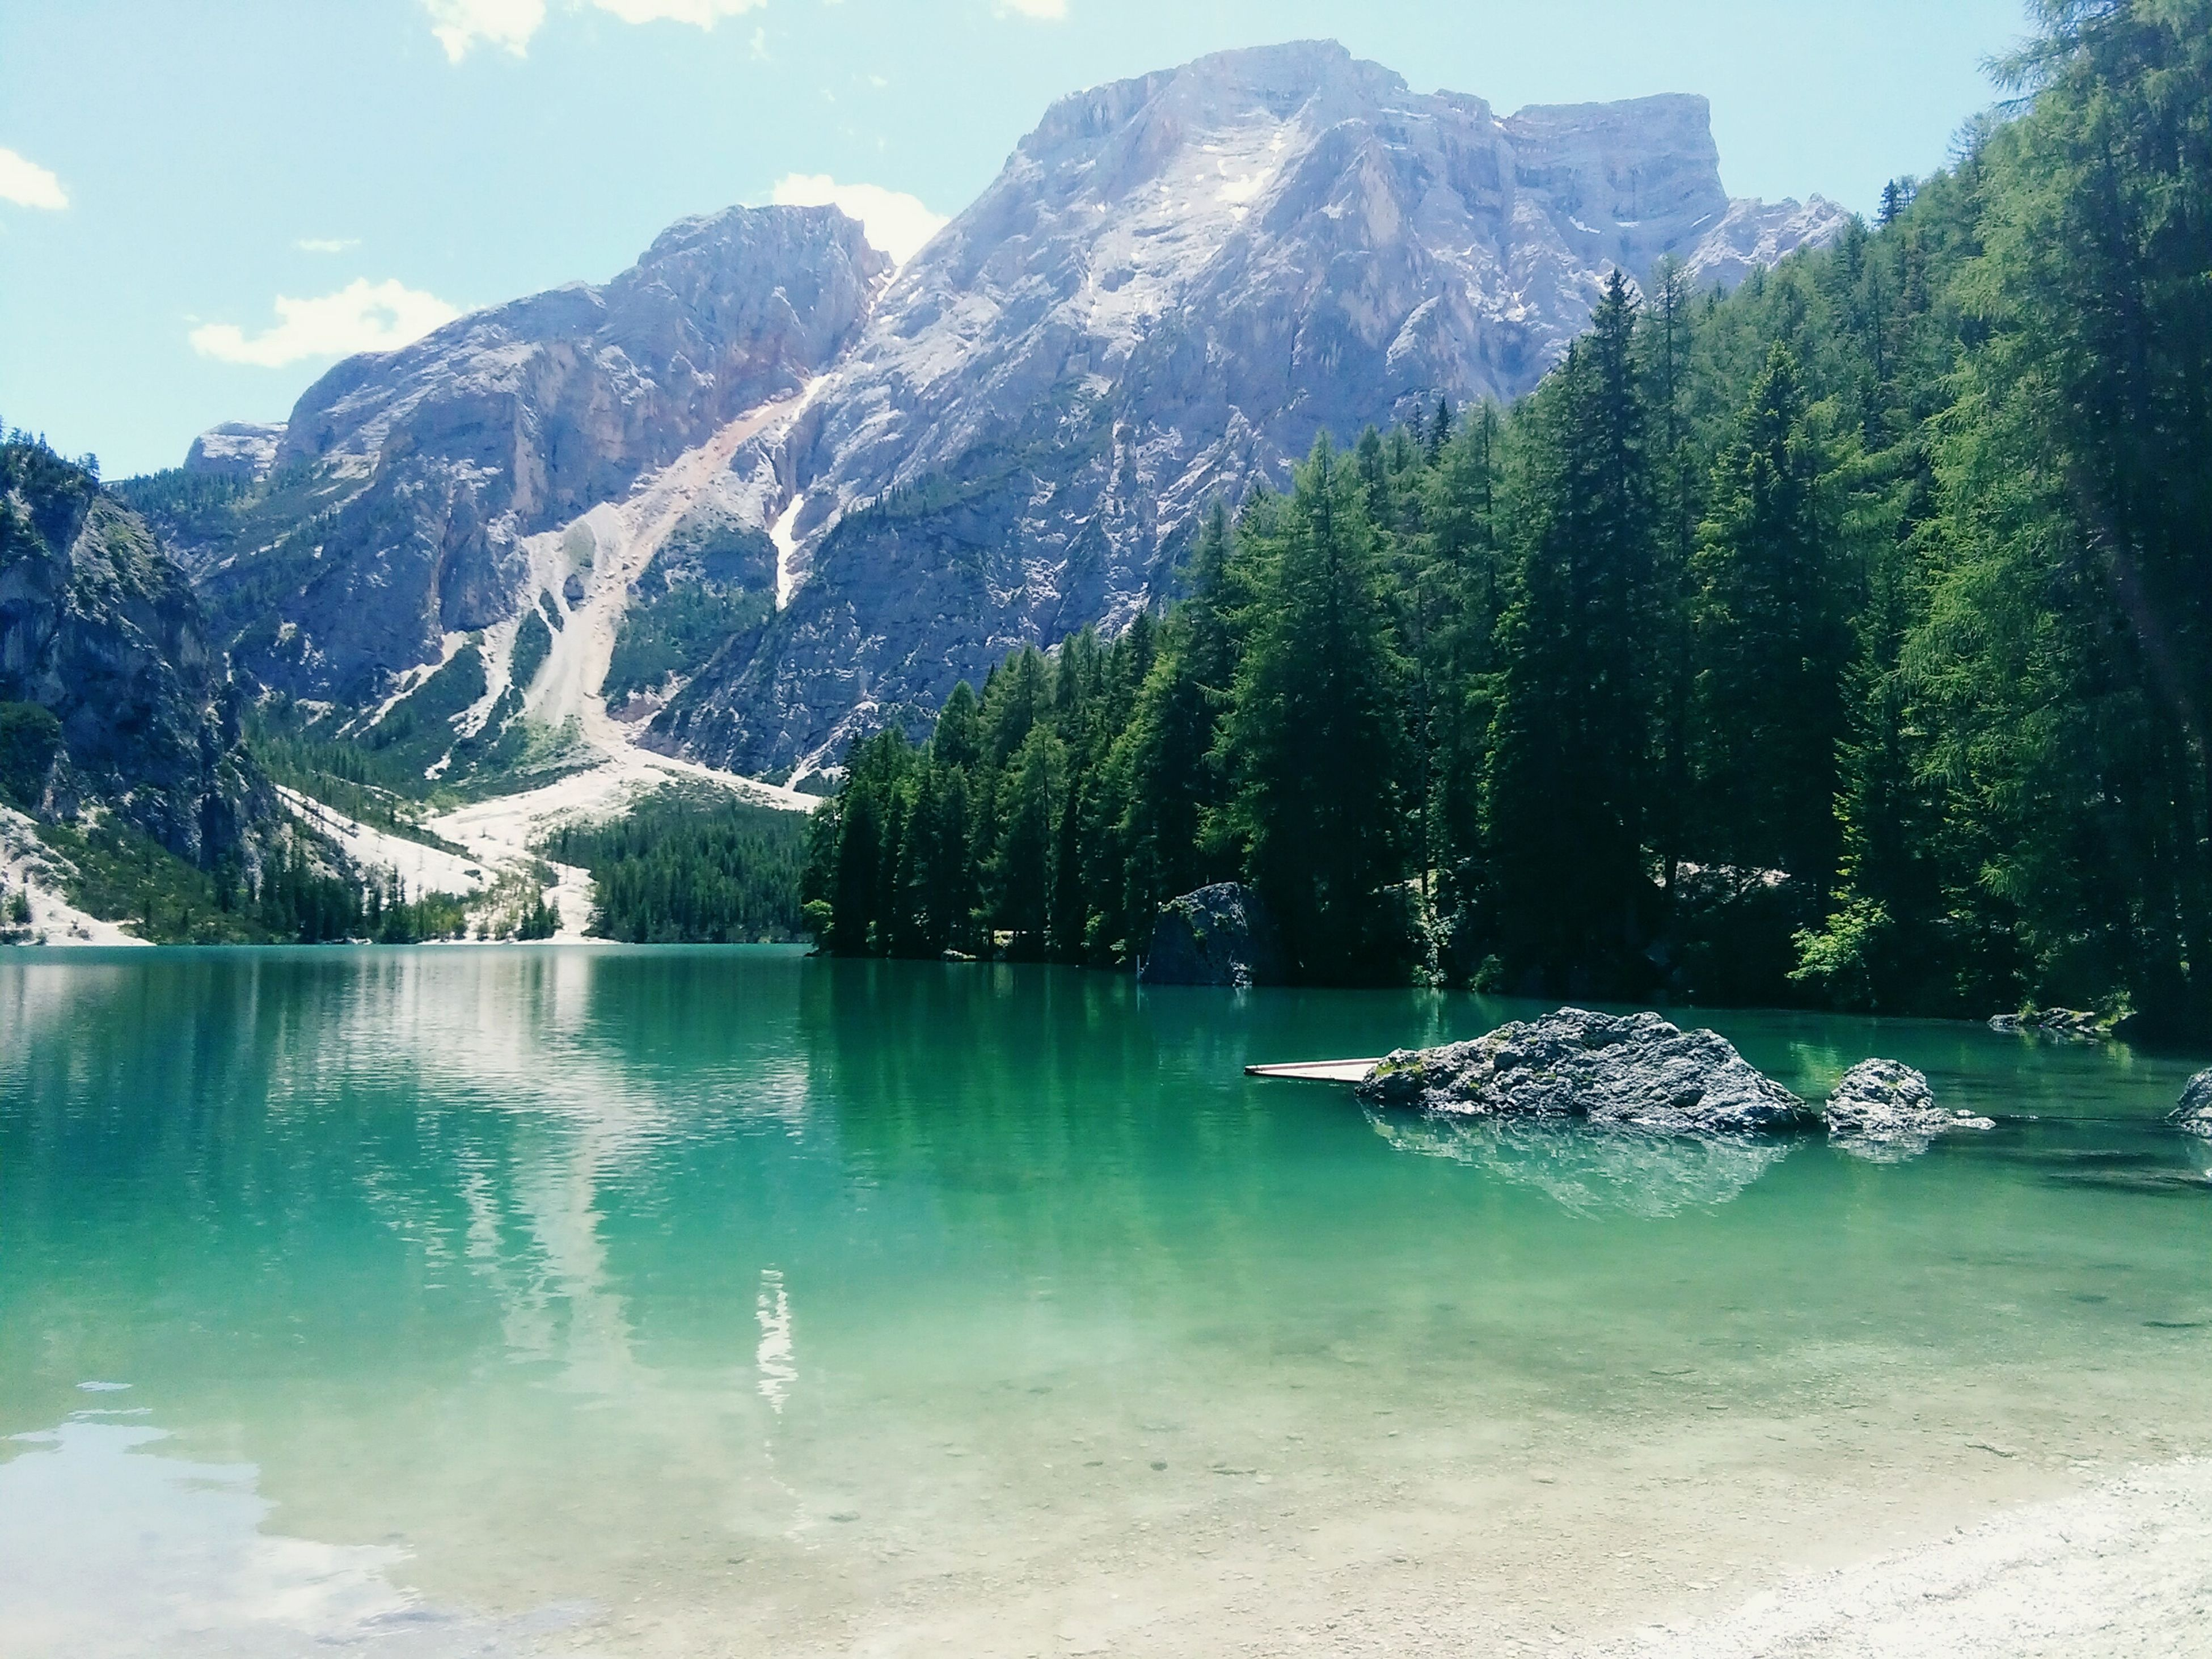 Hanging Out Taking Photos Hello World Relaxing Hi! Enjoying Life Italy Beautiful Trentino Alto Adige Lake